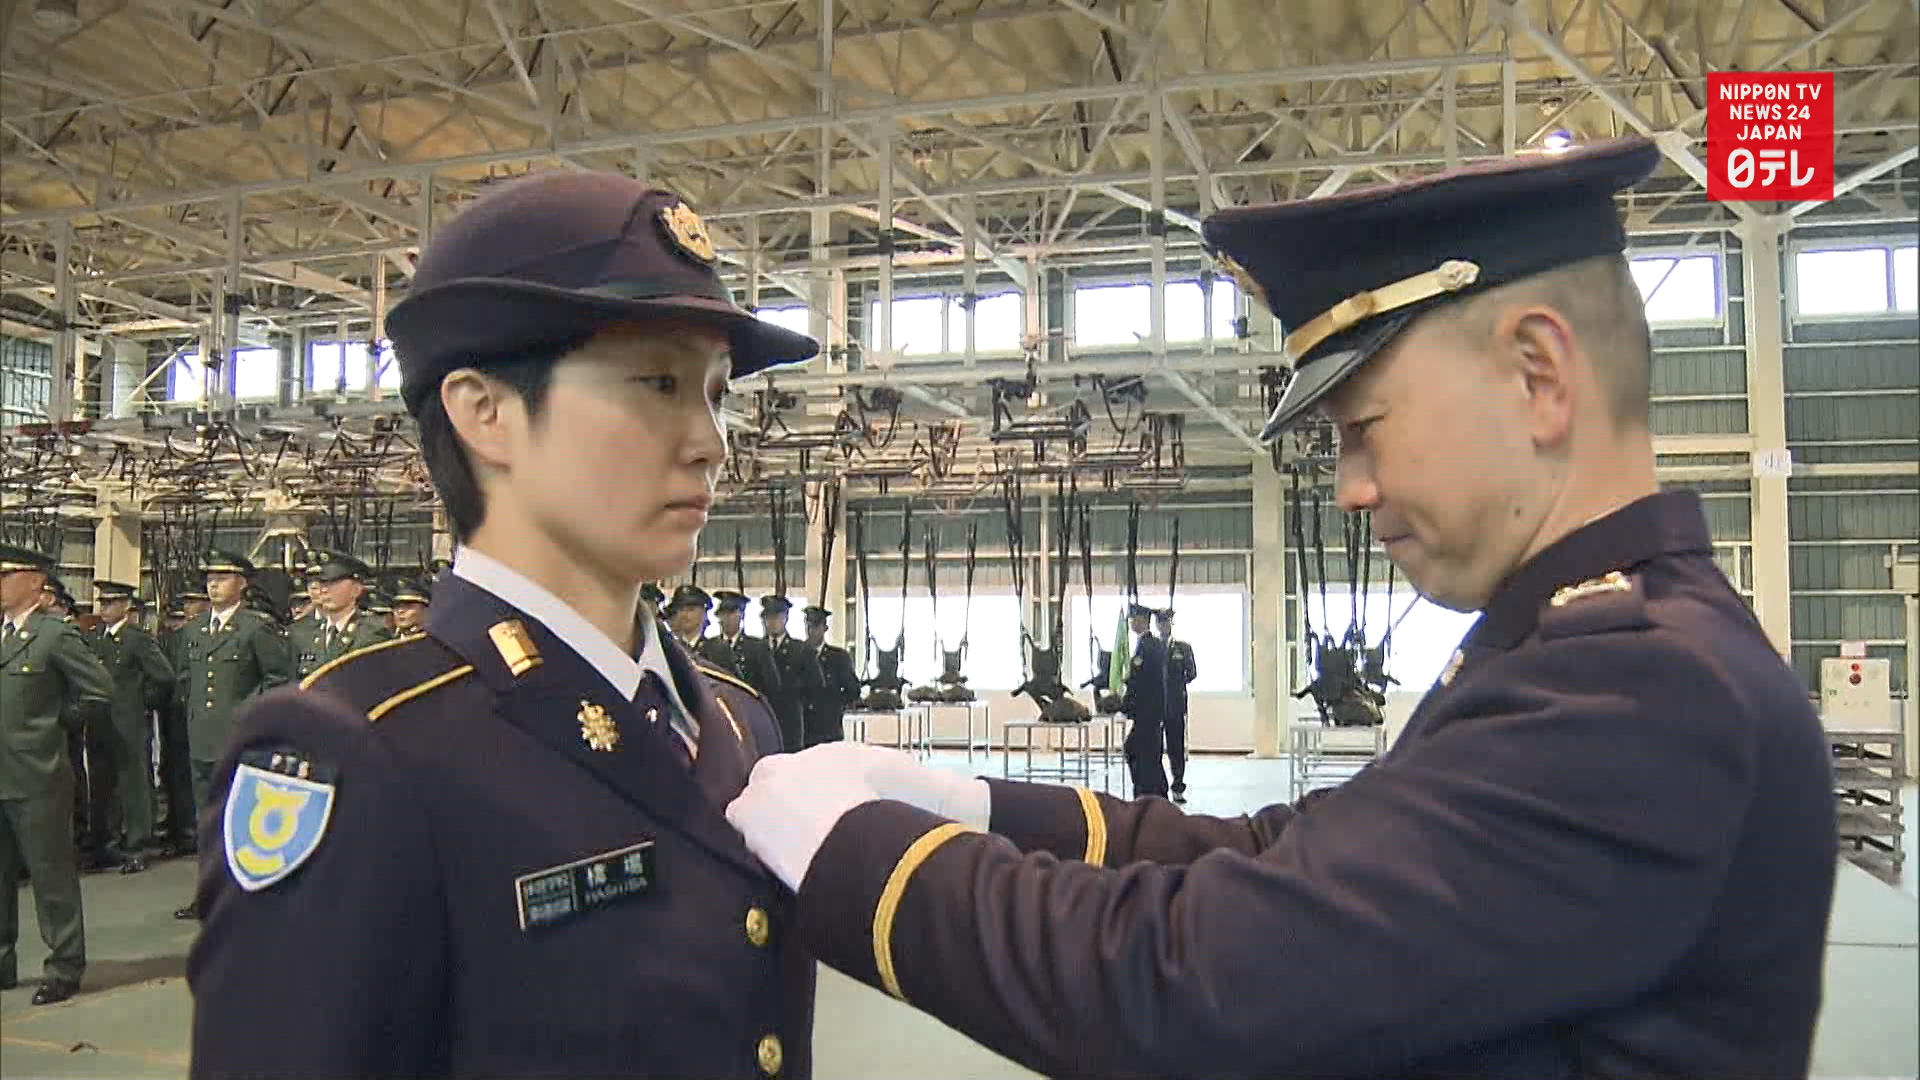 Japan's 1st female paratrooper